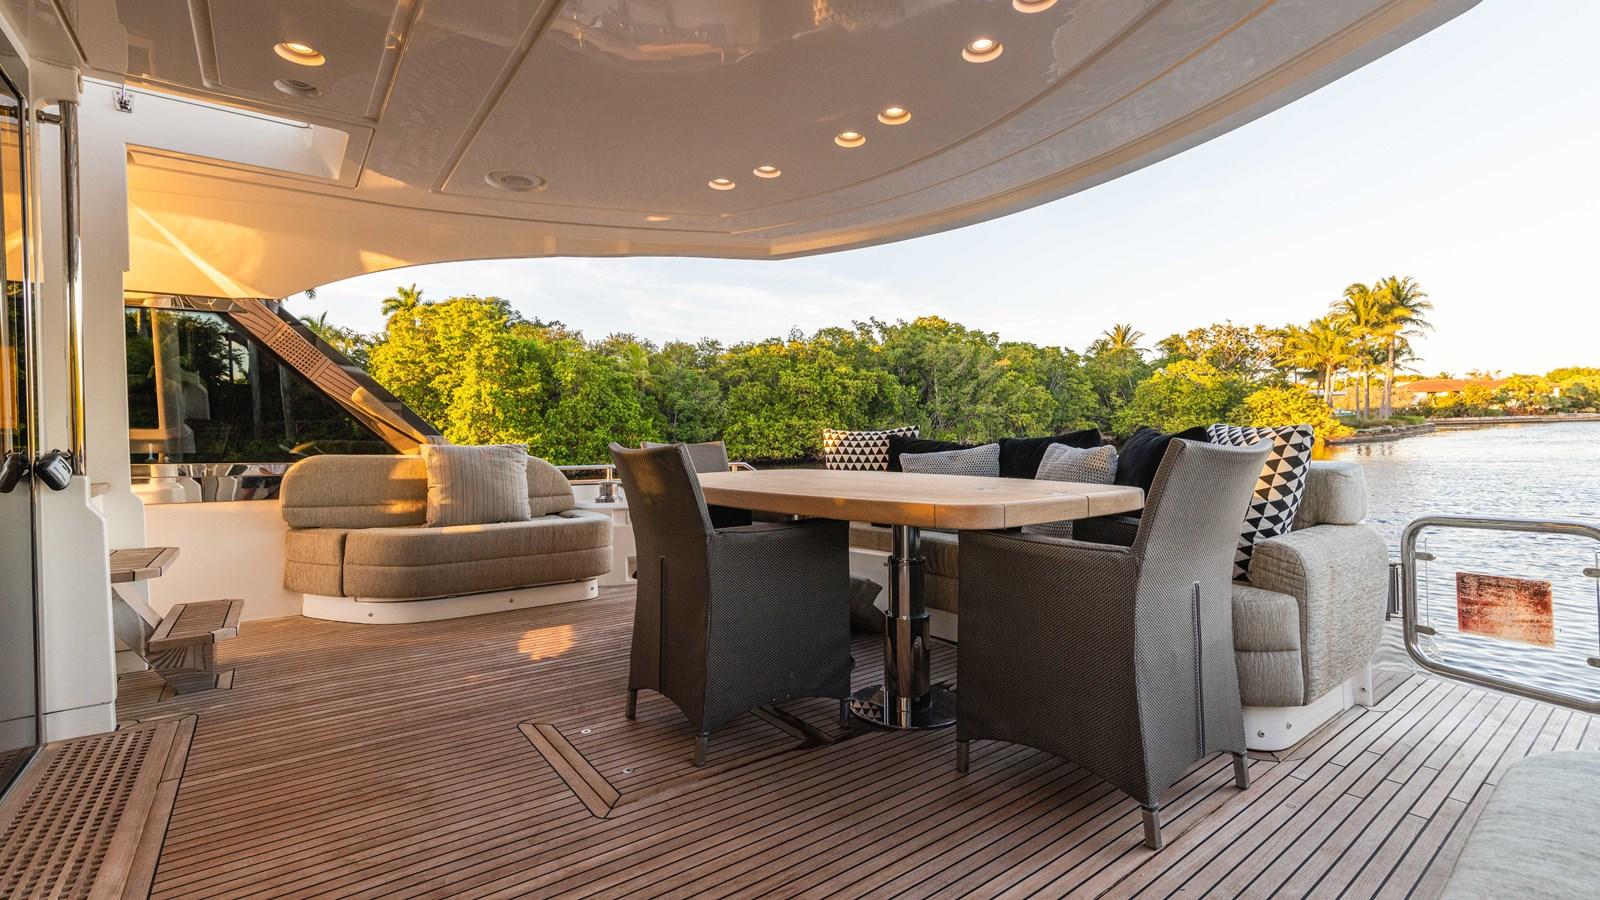 76 Monte Carlo (66 of 127) 2014 MONTE CARLO YACHTS Motoryacht Motor Yacht 2825060